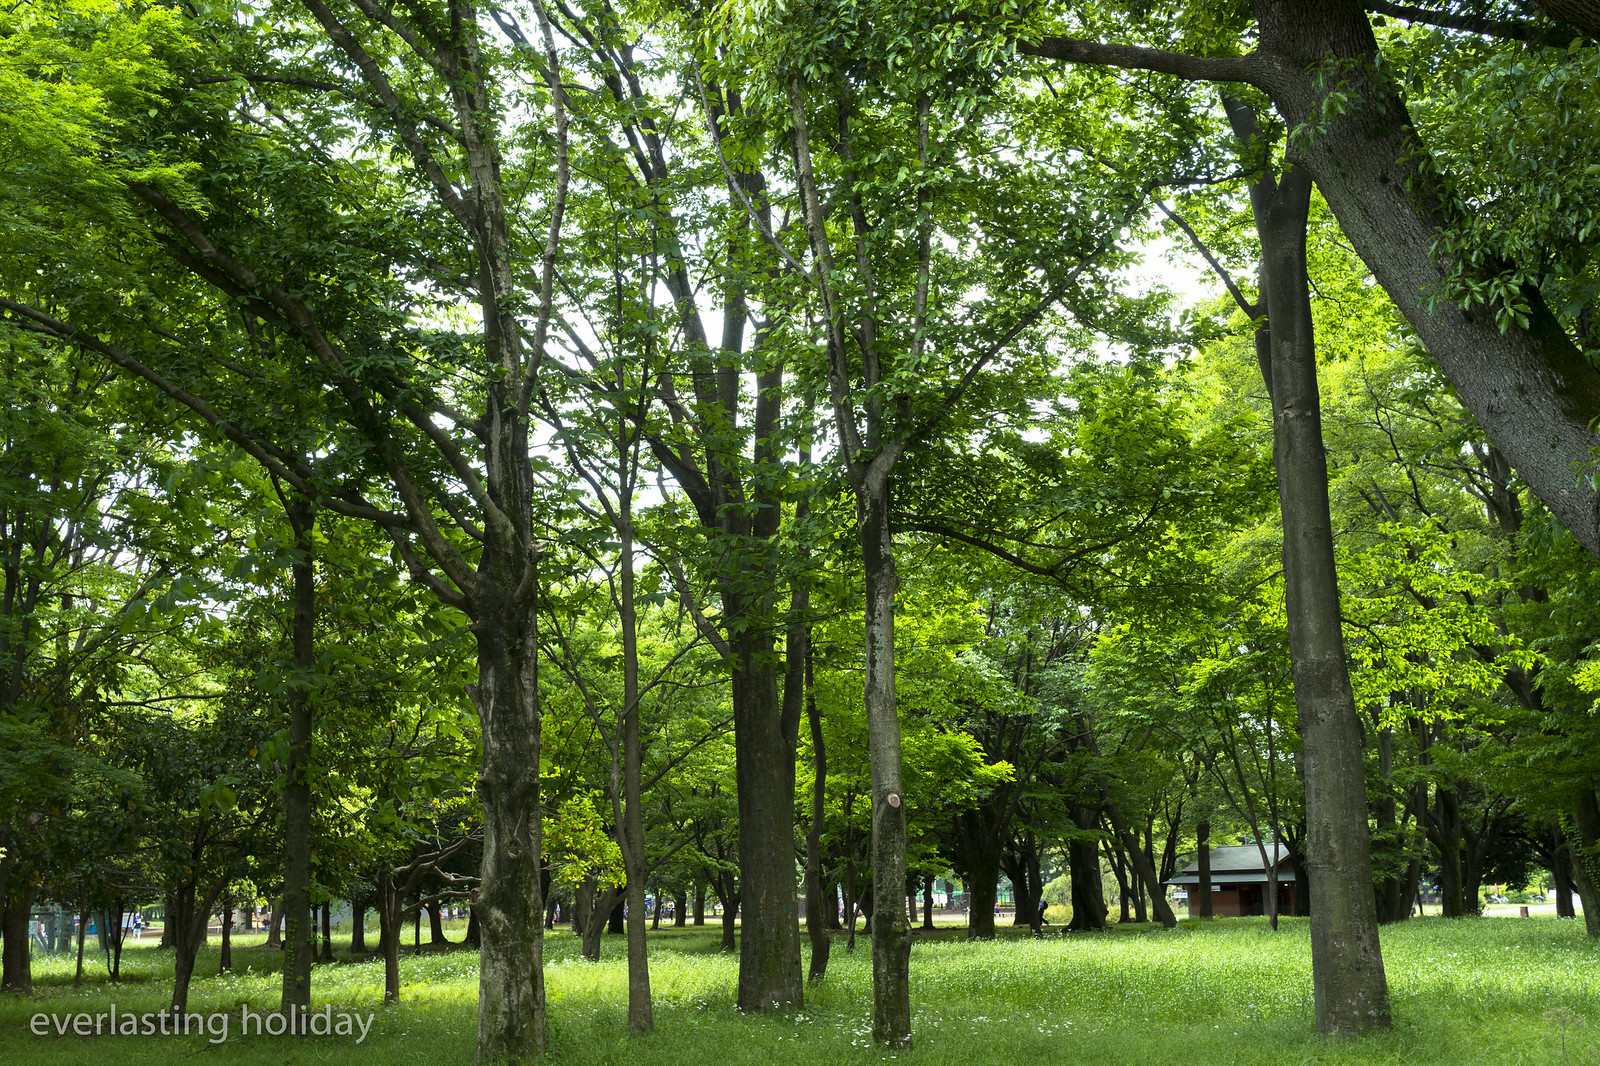 小金井公園 Koganei Park-0022